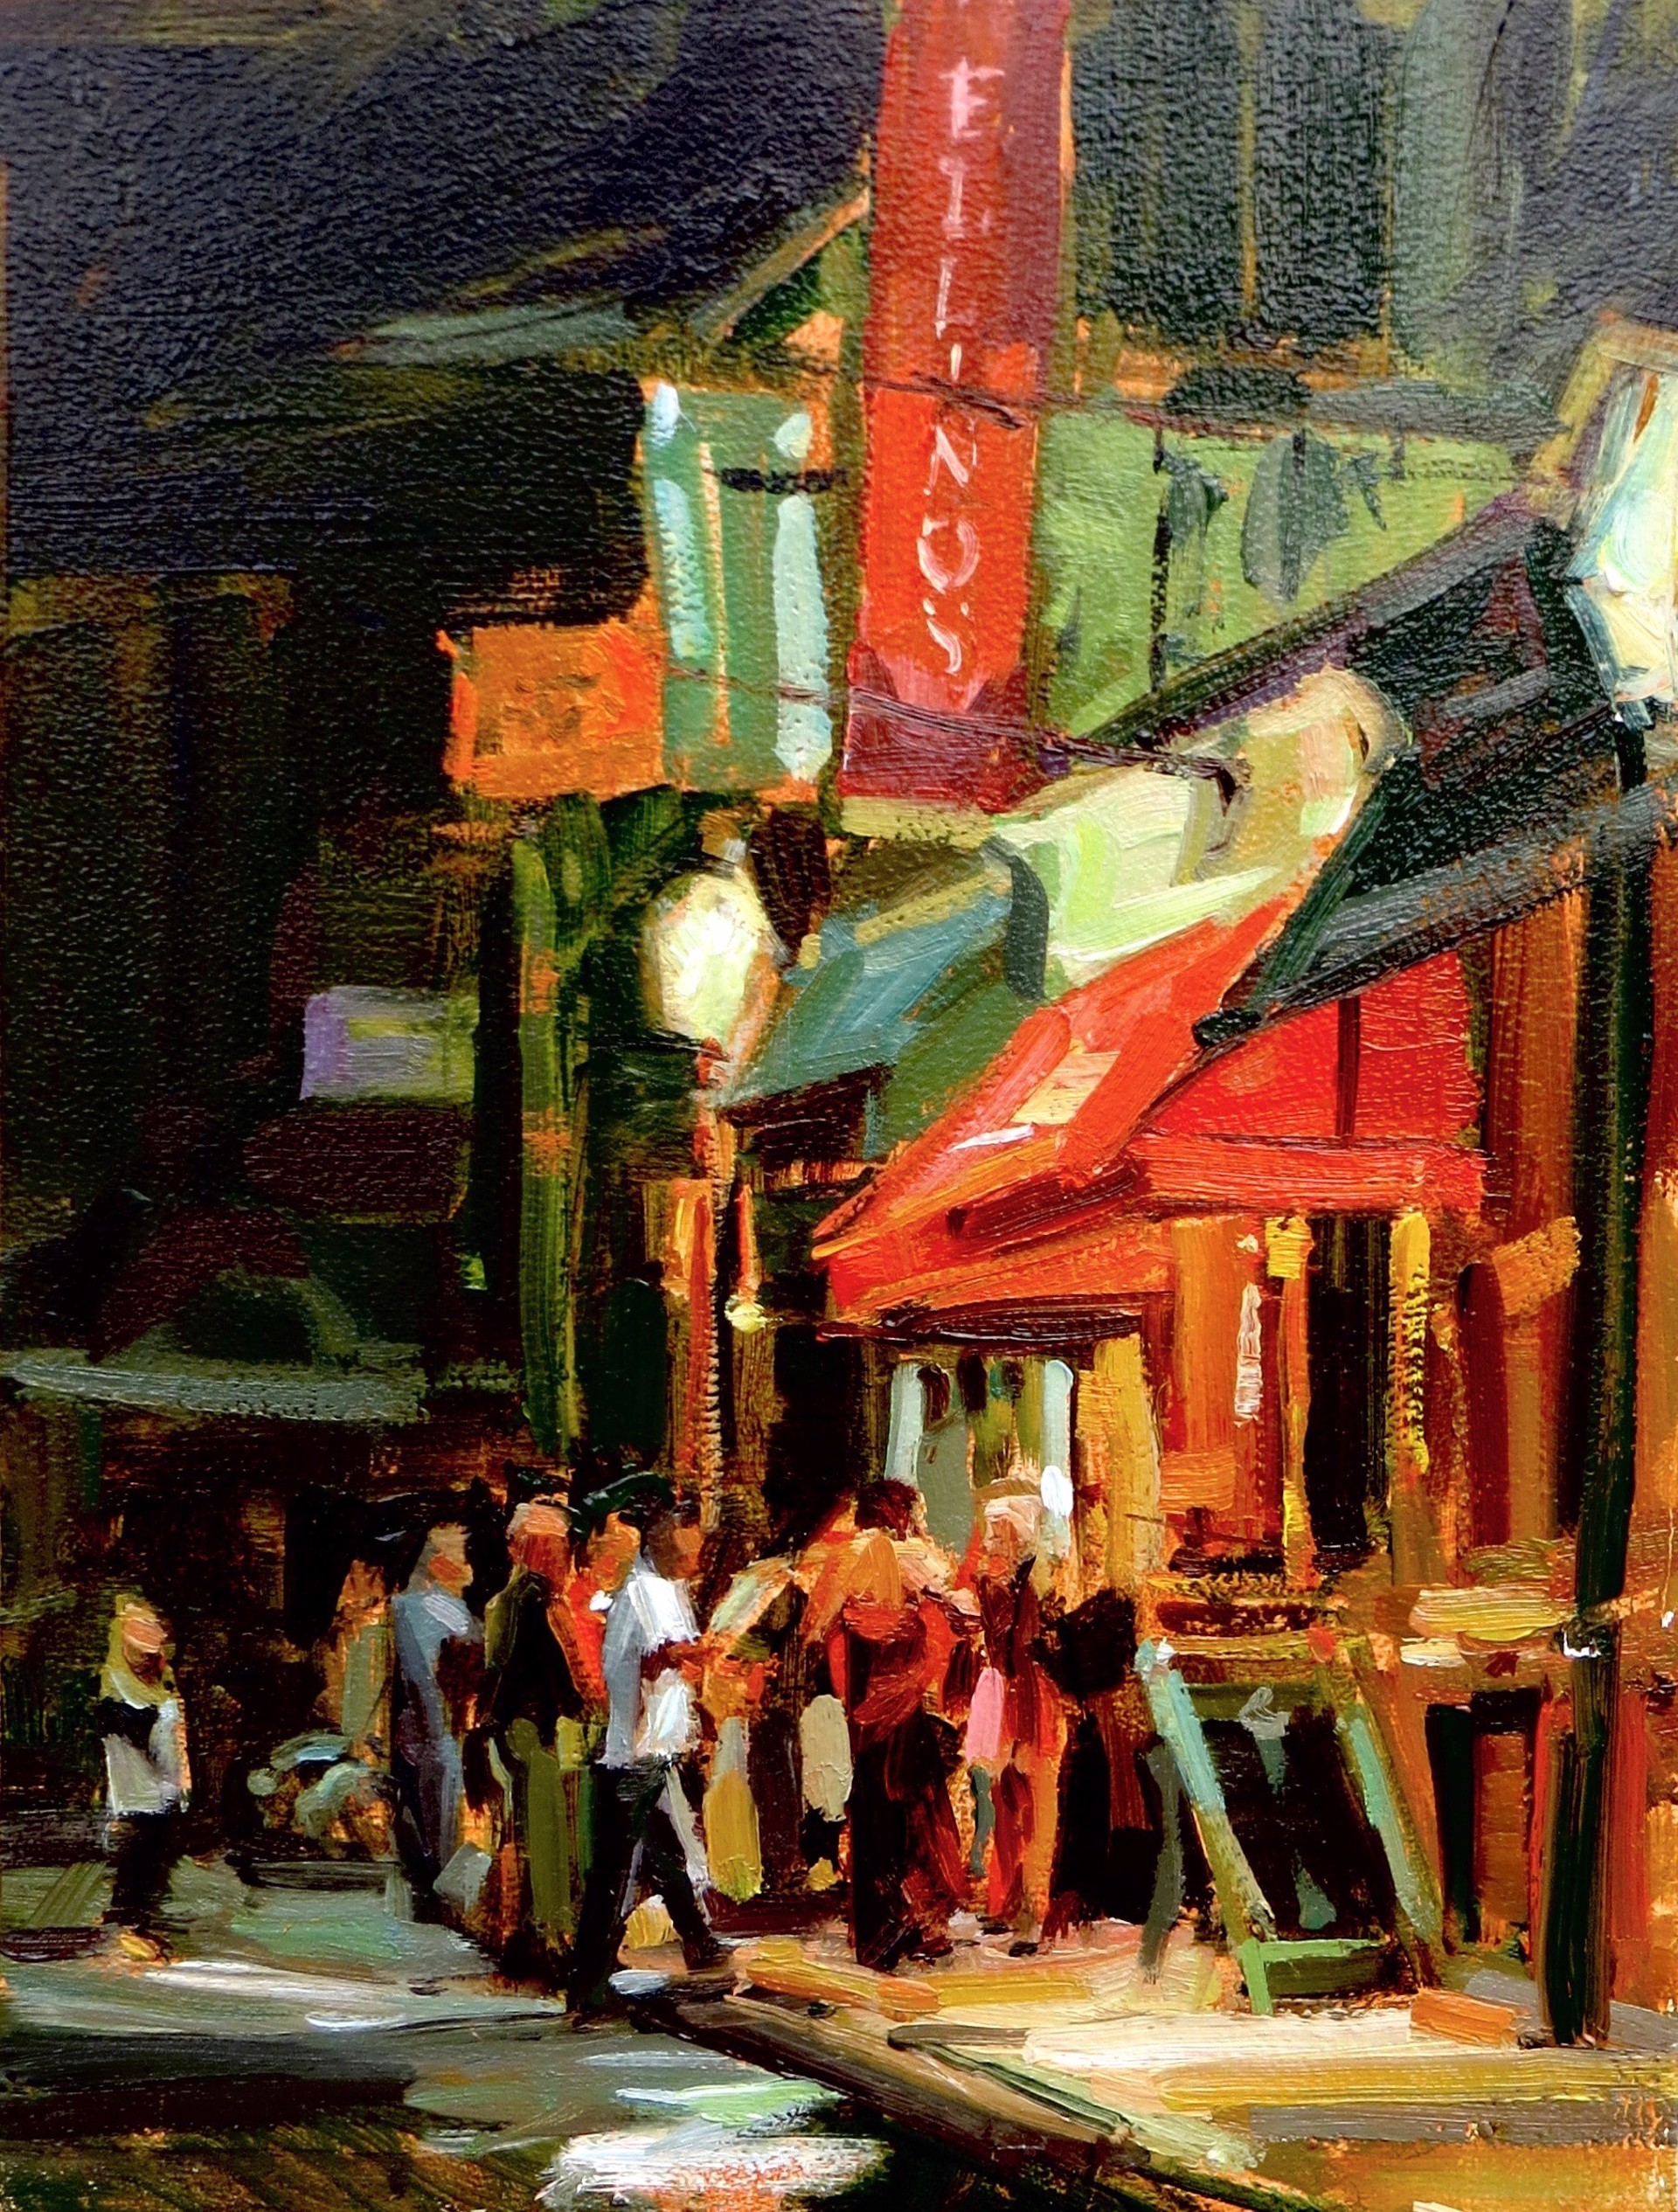 North End Nightlife by Eli Cedrone